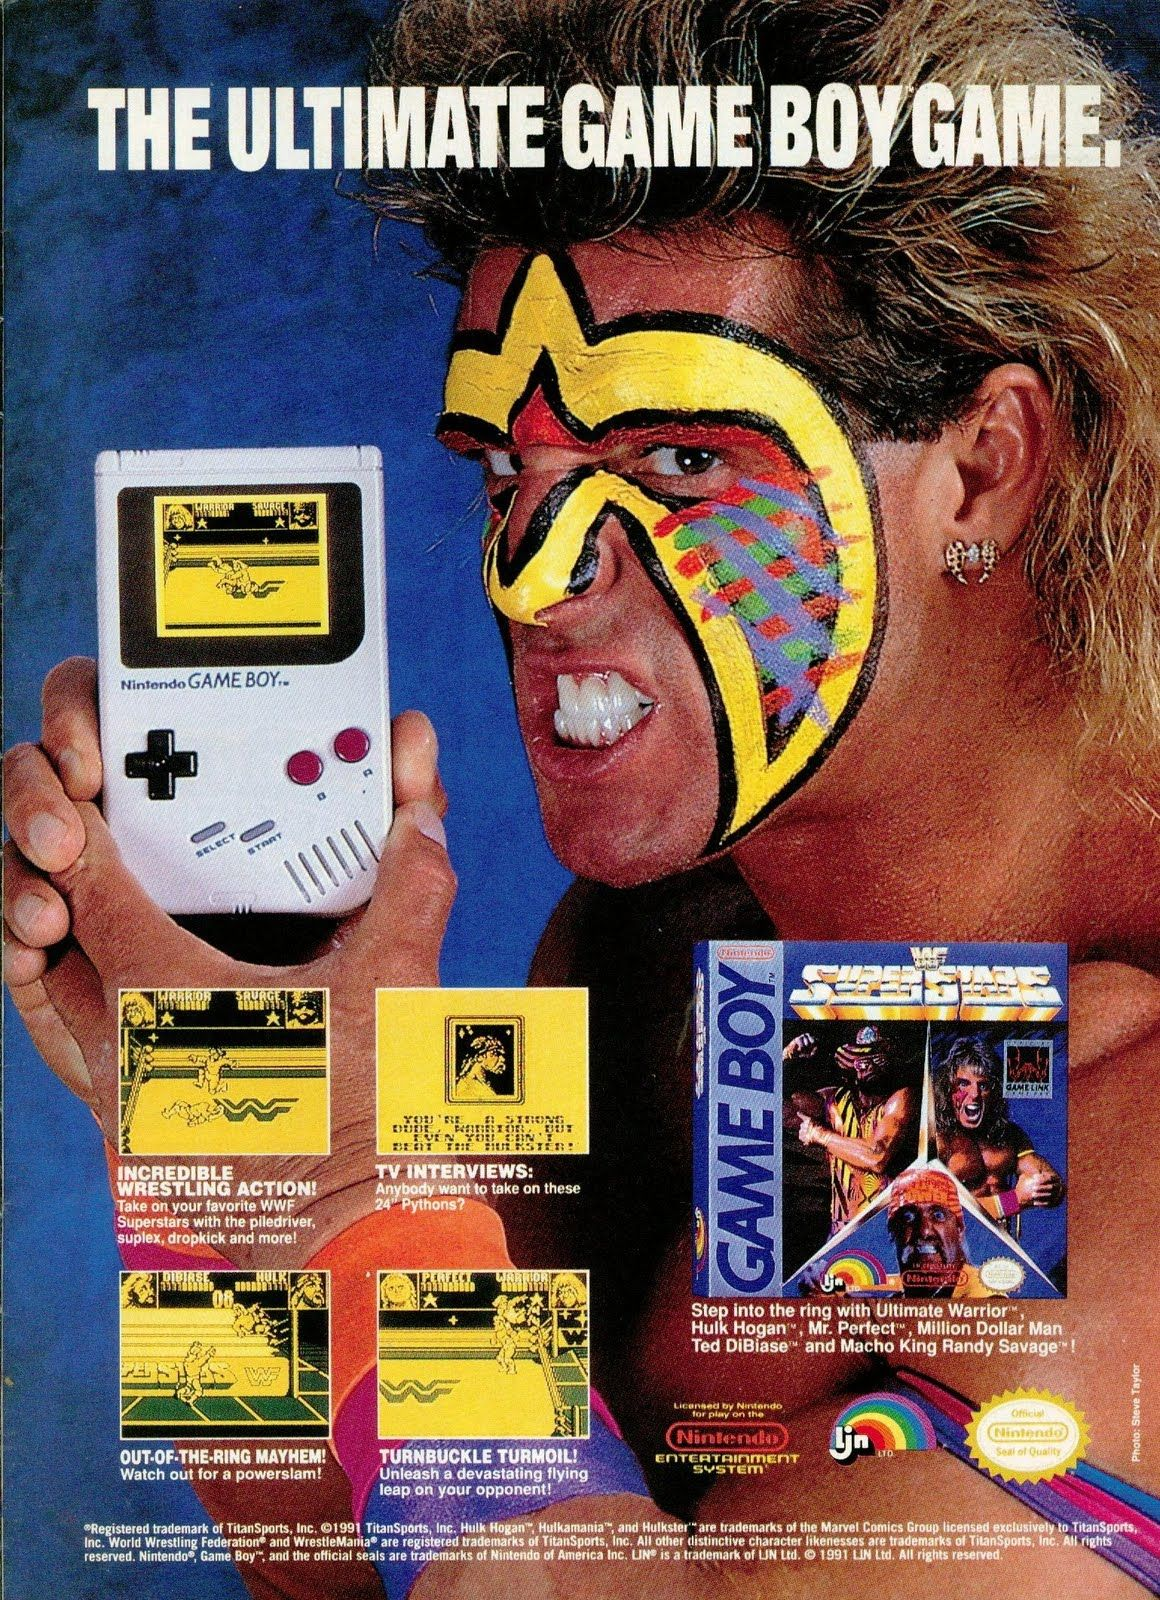 WWF Superstars Nintendo Gameboy ad